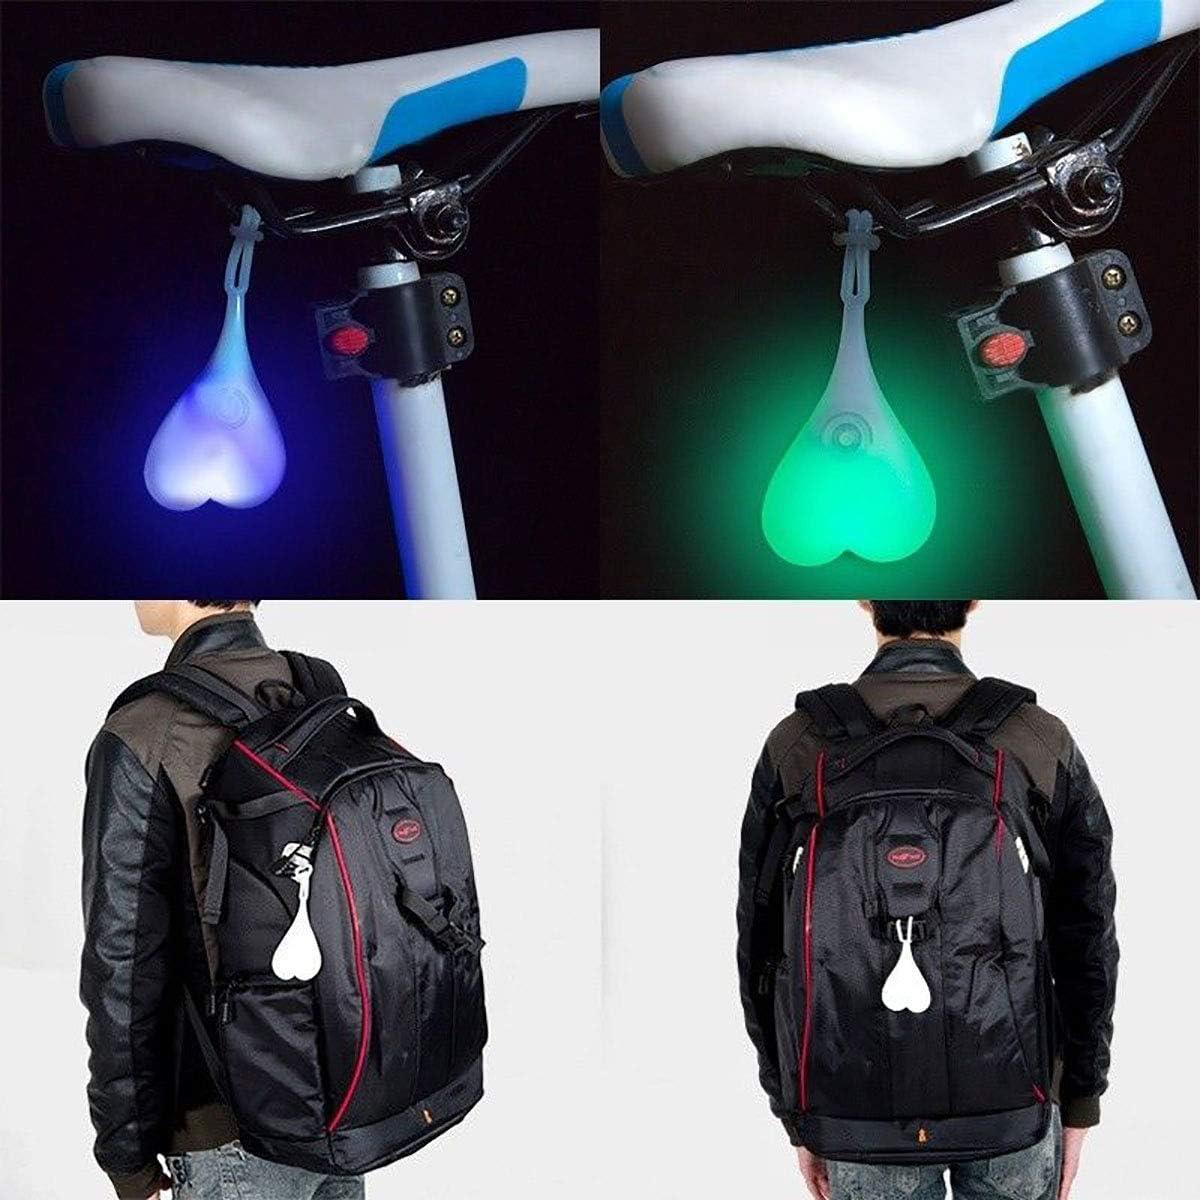 Gazelle Trading Bike Ball Lights Bicycle Cycling LED Flash Night Safety Rear Tail Light Waterproof Warning Night Silicone Bike Back Light Heart-Shaped Egg Warning Signal Lamp